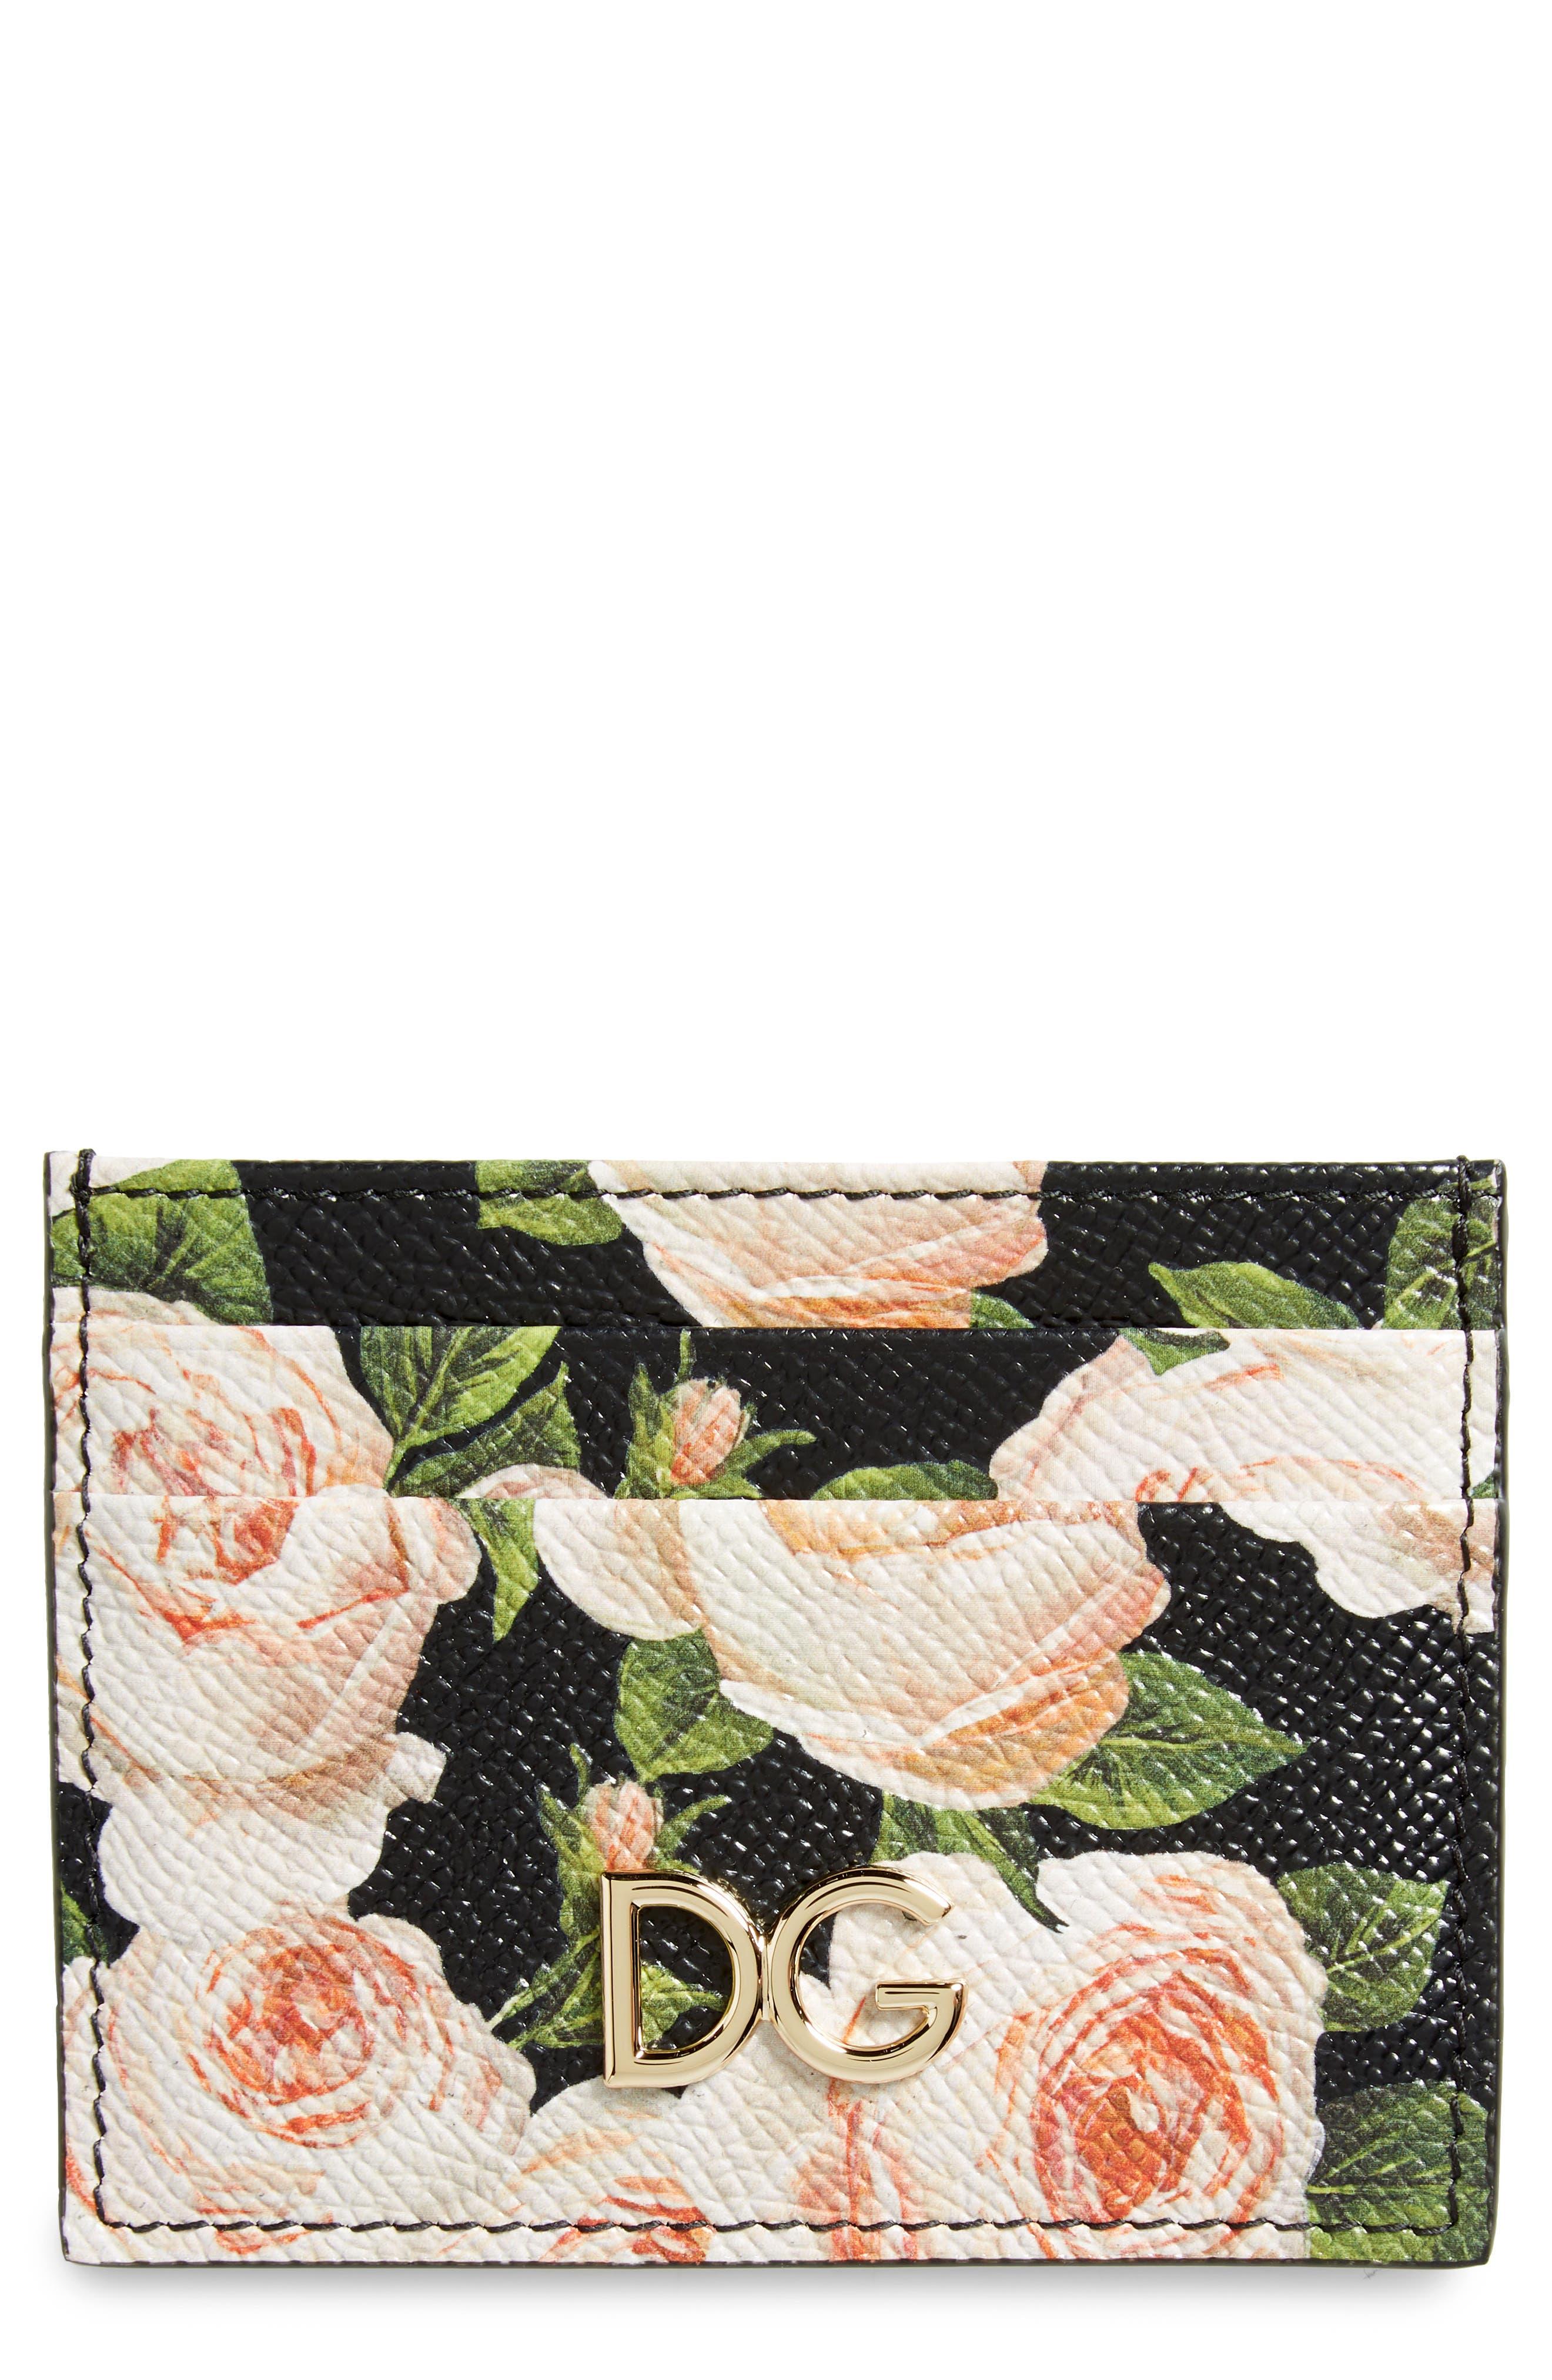 DOLCE&GABBANA, Rose Print Leather Card Case, Main thumbnail 1, color, 001